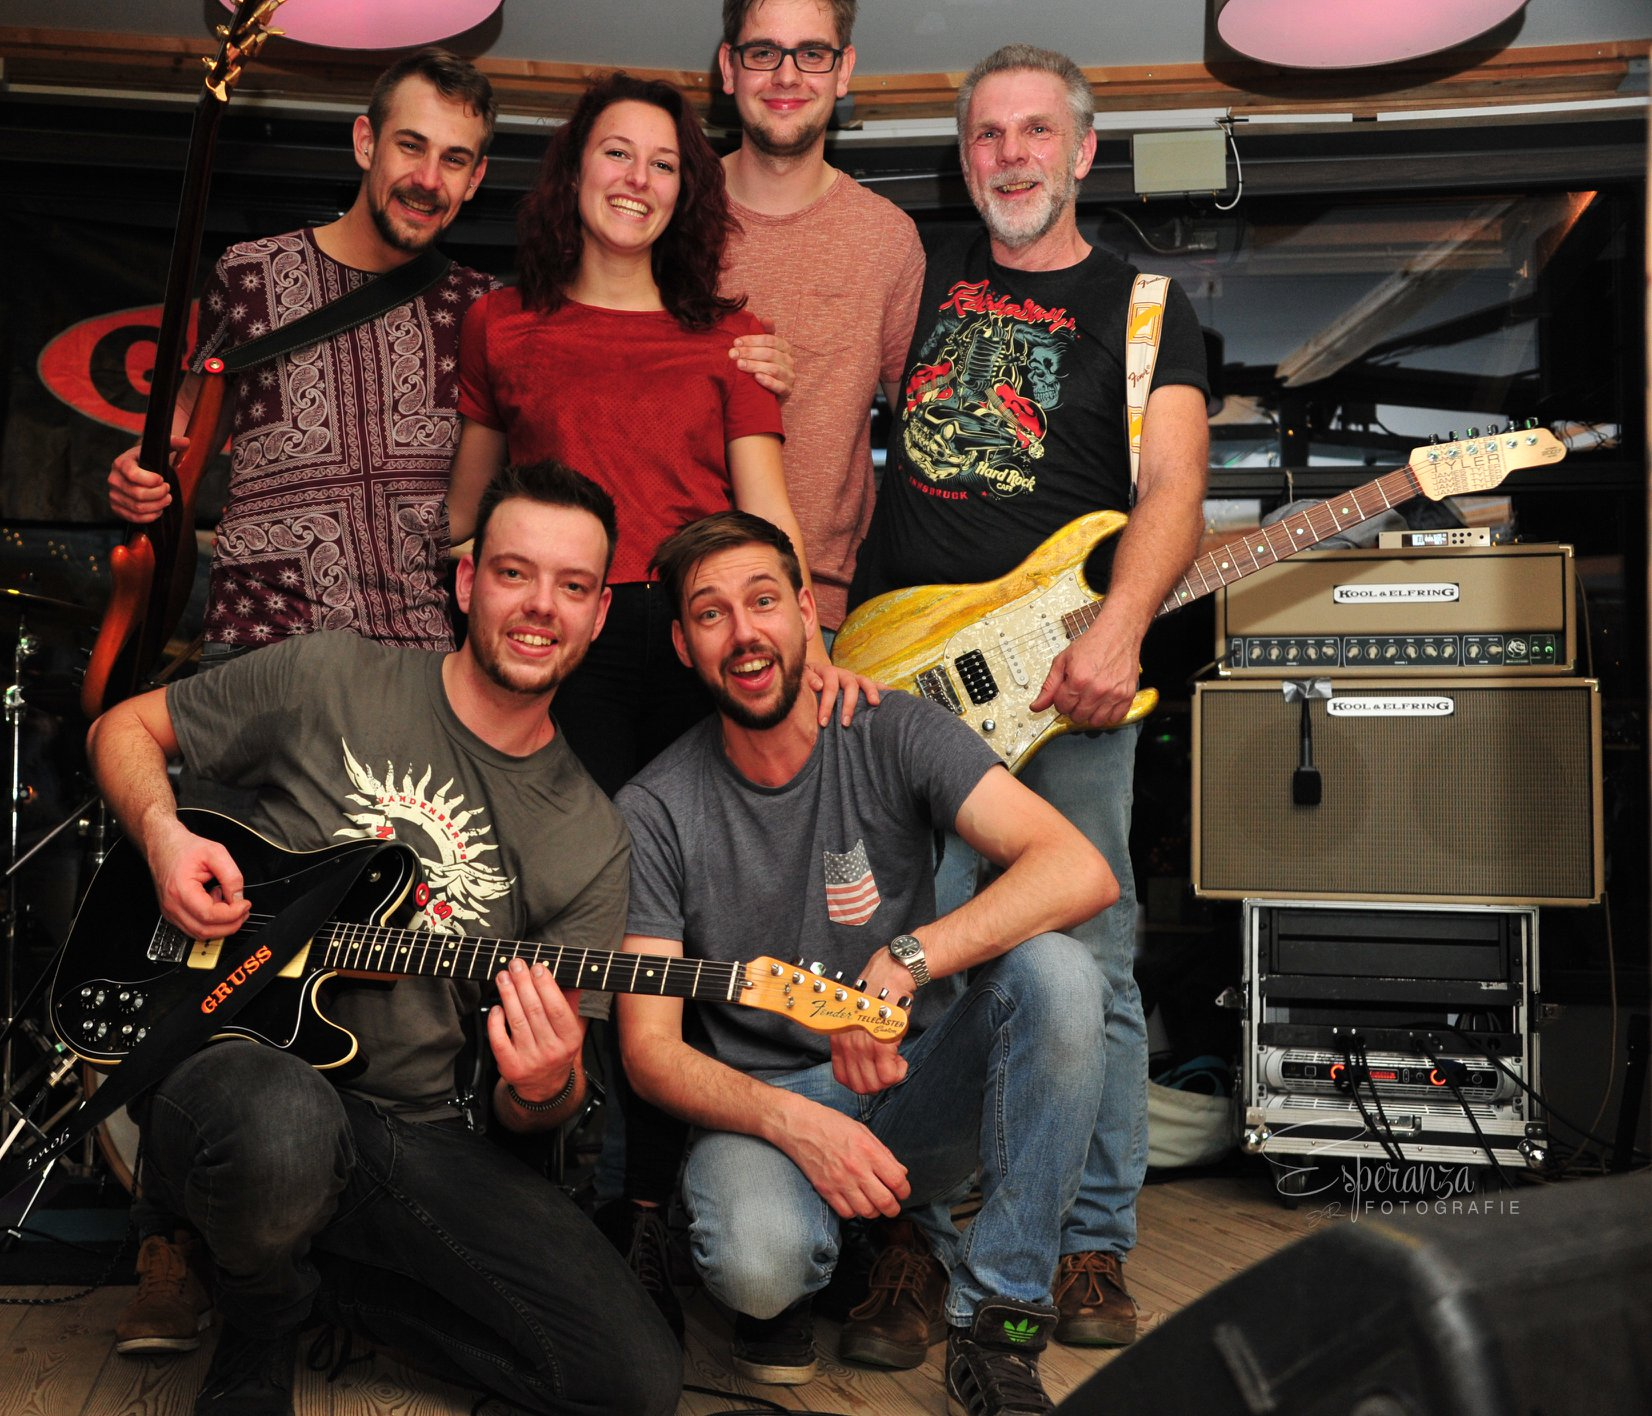 Gruss live in de Panta Rhei in Vlissingen